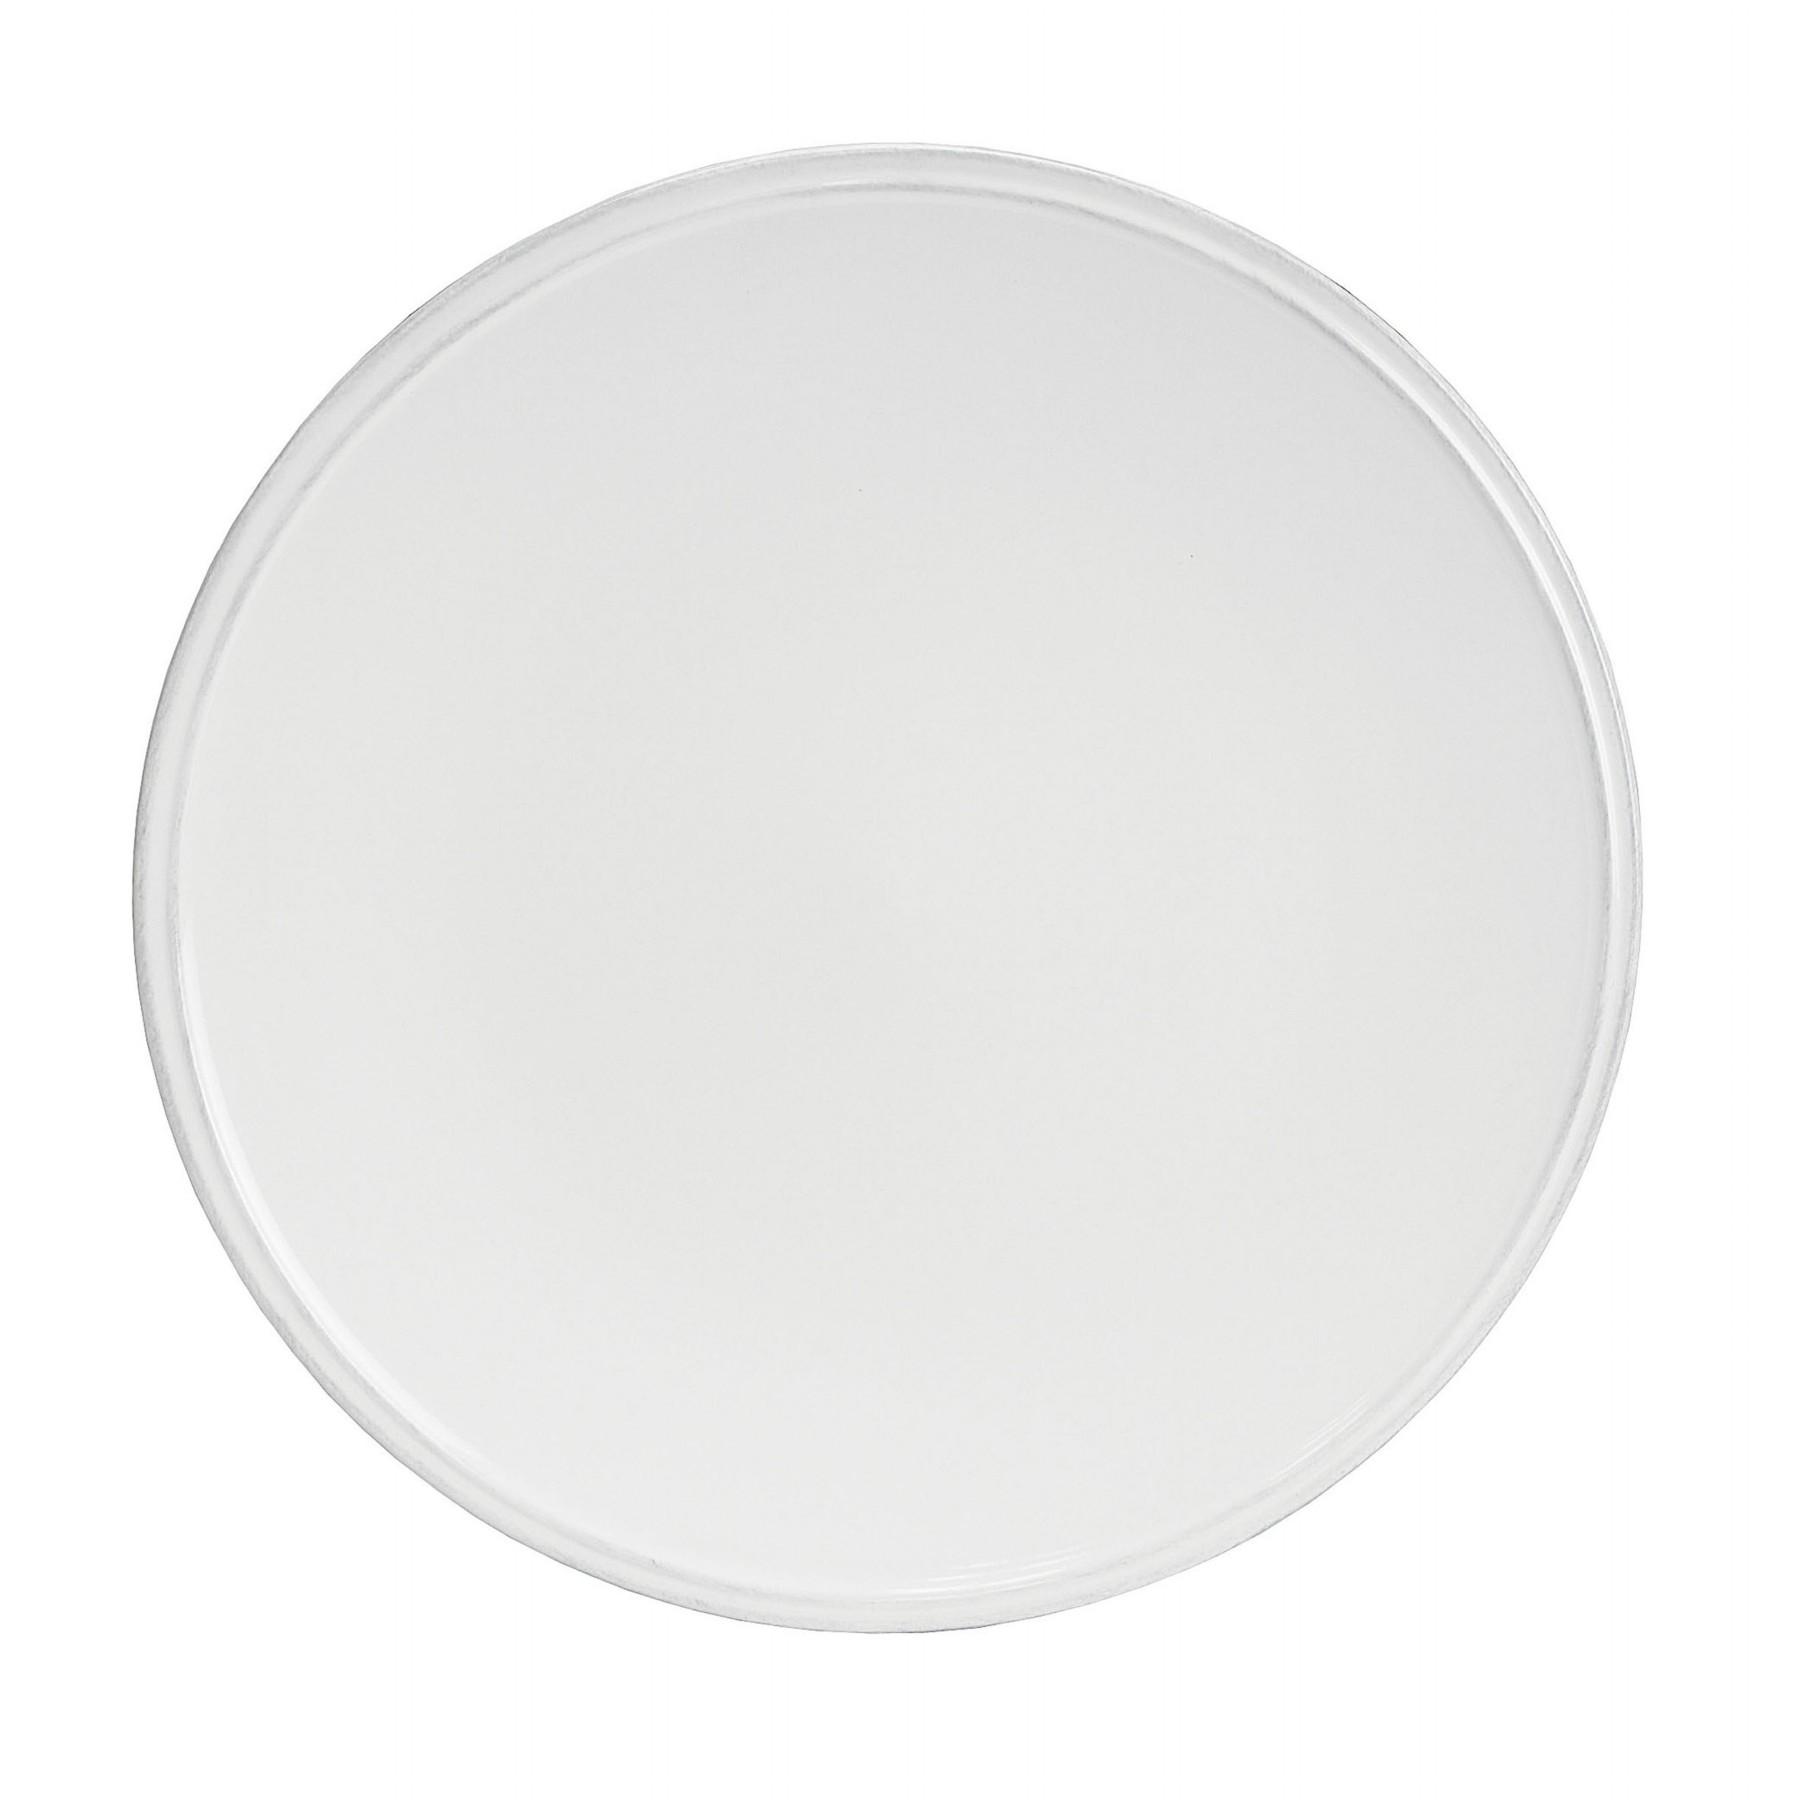 COSTA NOVA Talíř Friso 28cm bílý